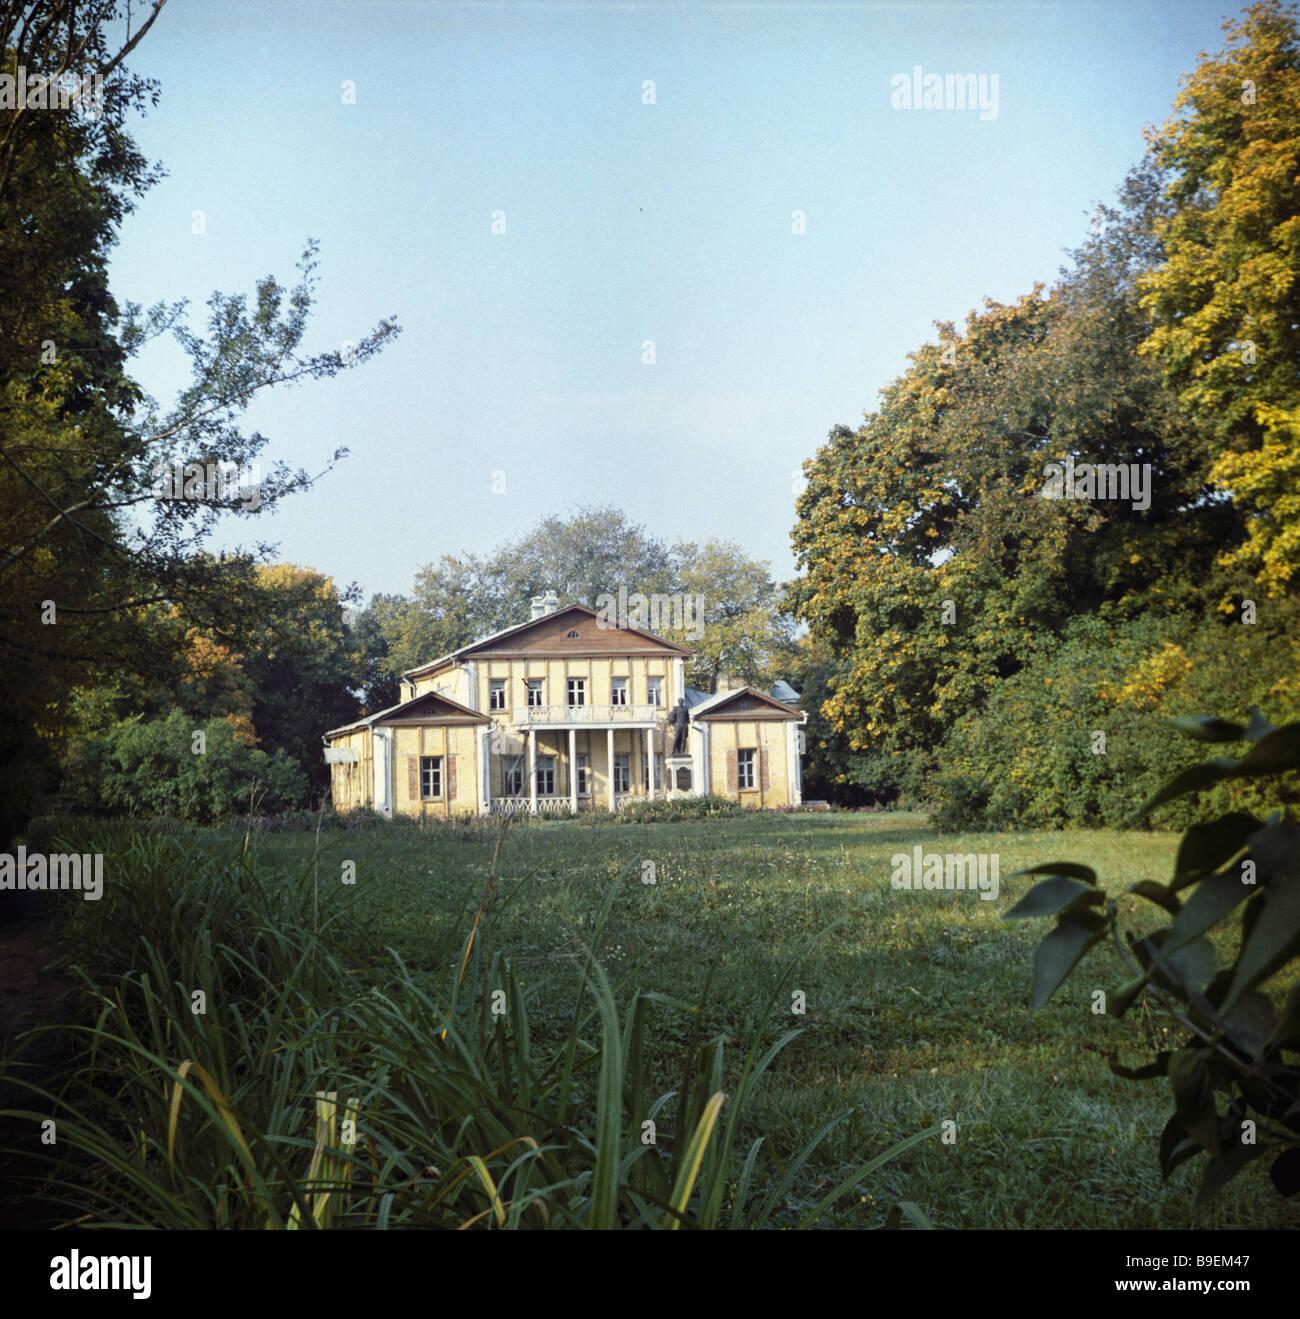 The squire s house on the Tarkhany estate of Elizaveta Arsenyeva poet Mikhail Lermontov s grandmother Lermontovo - Stock Image